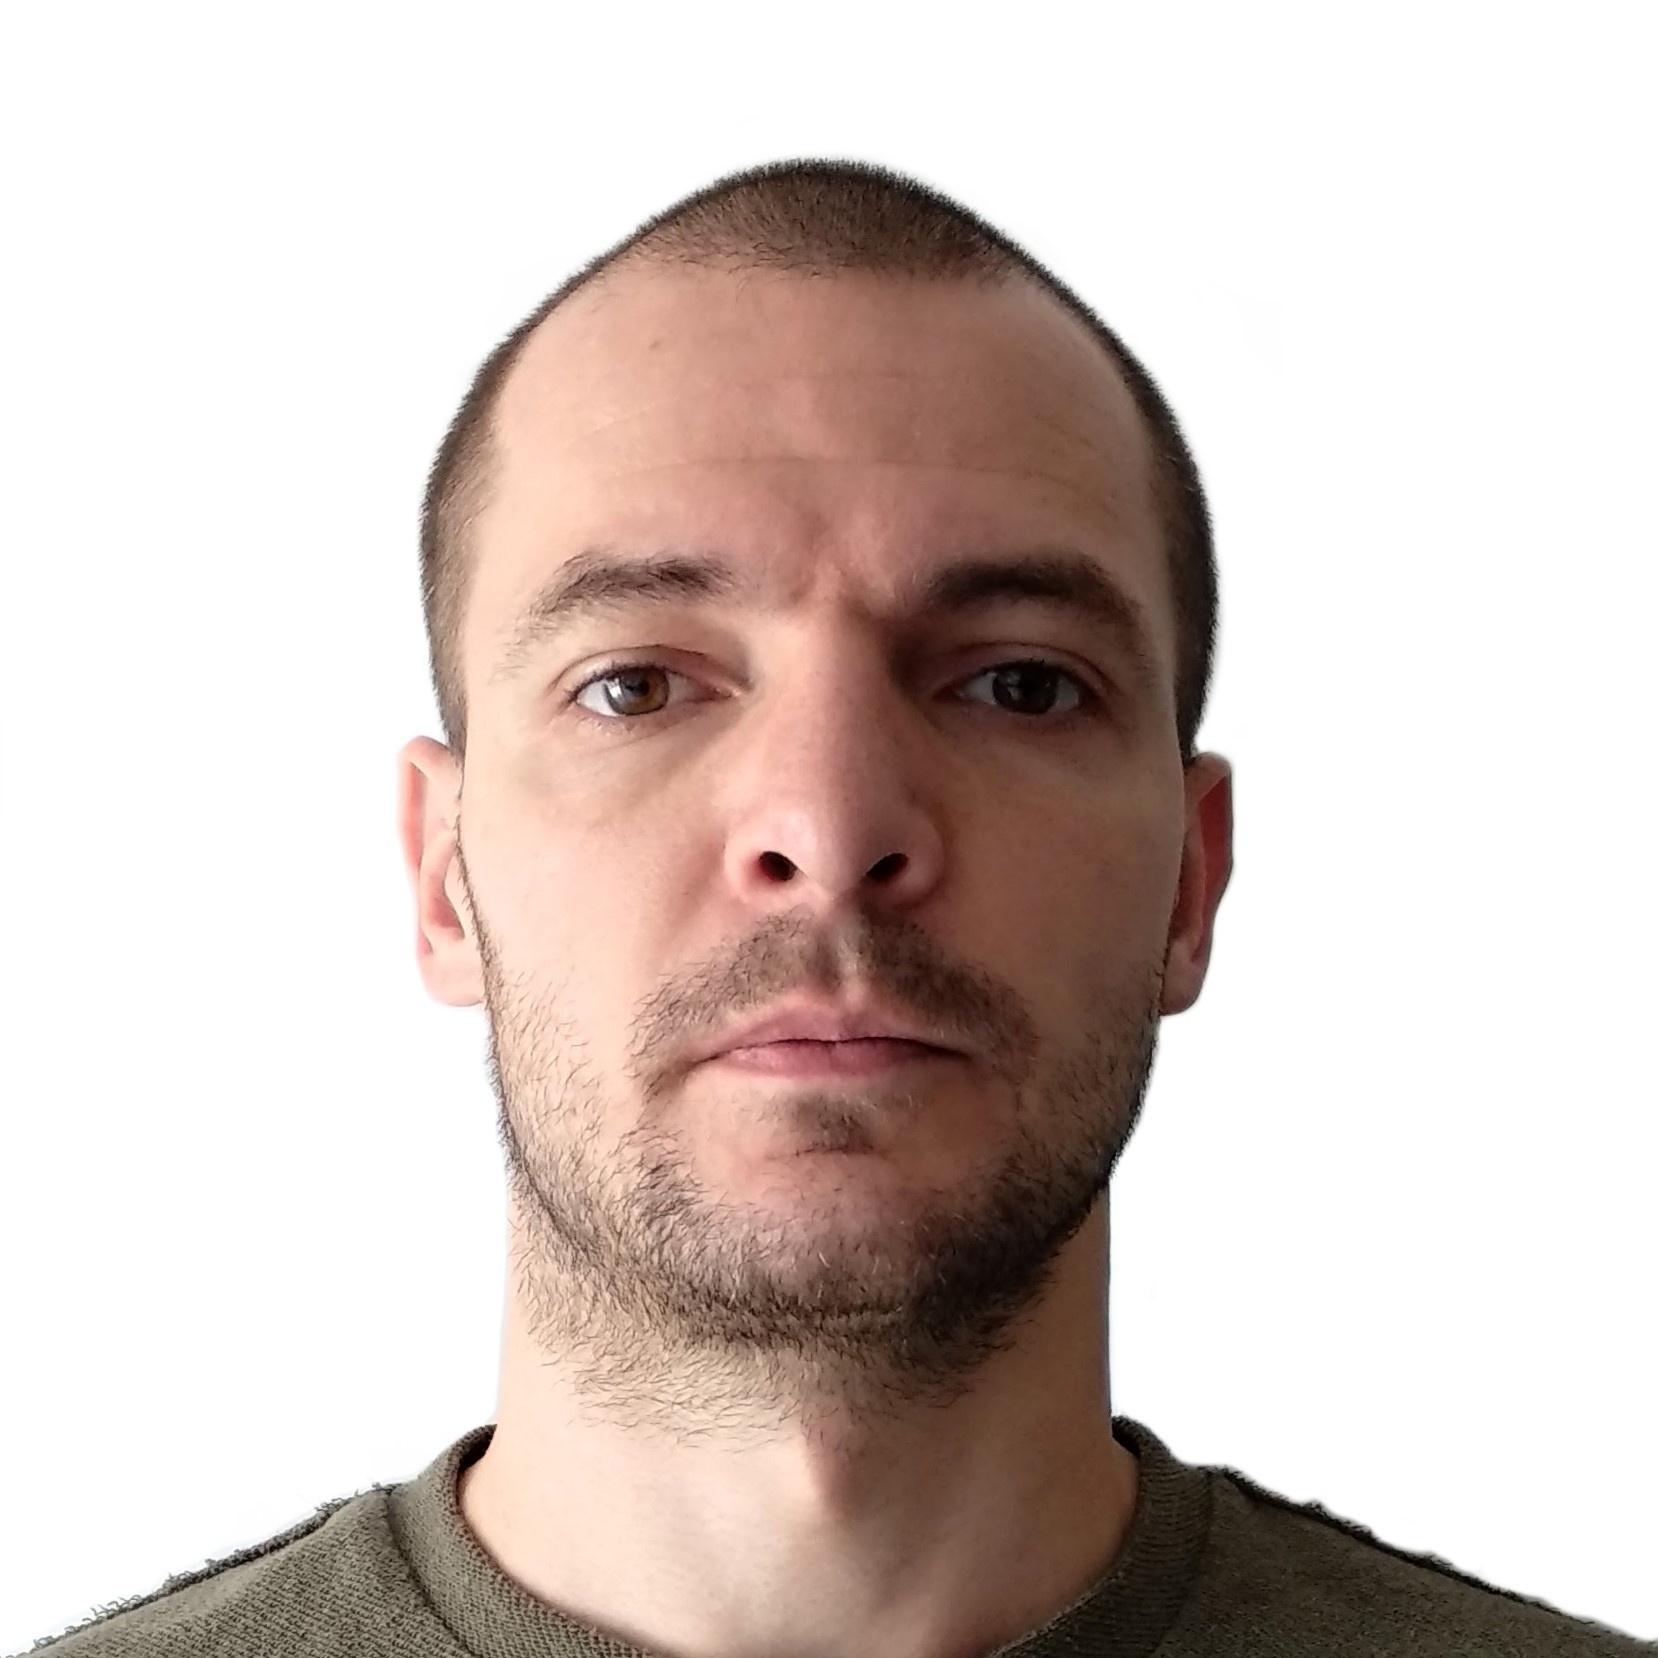 Bc. Lukáš Tóth